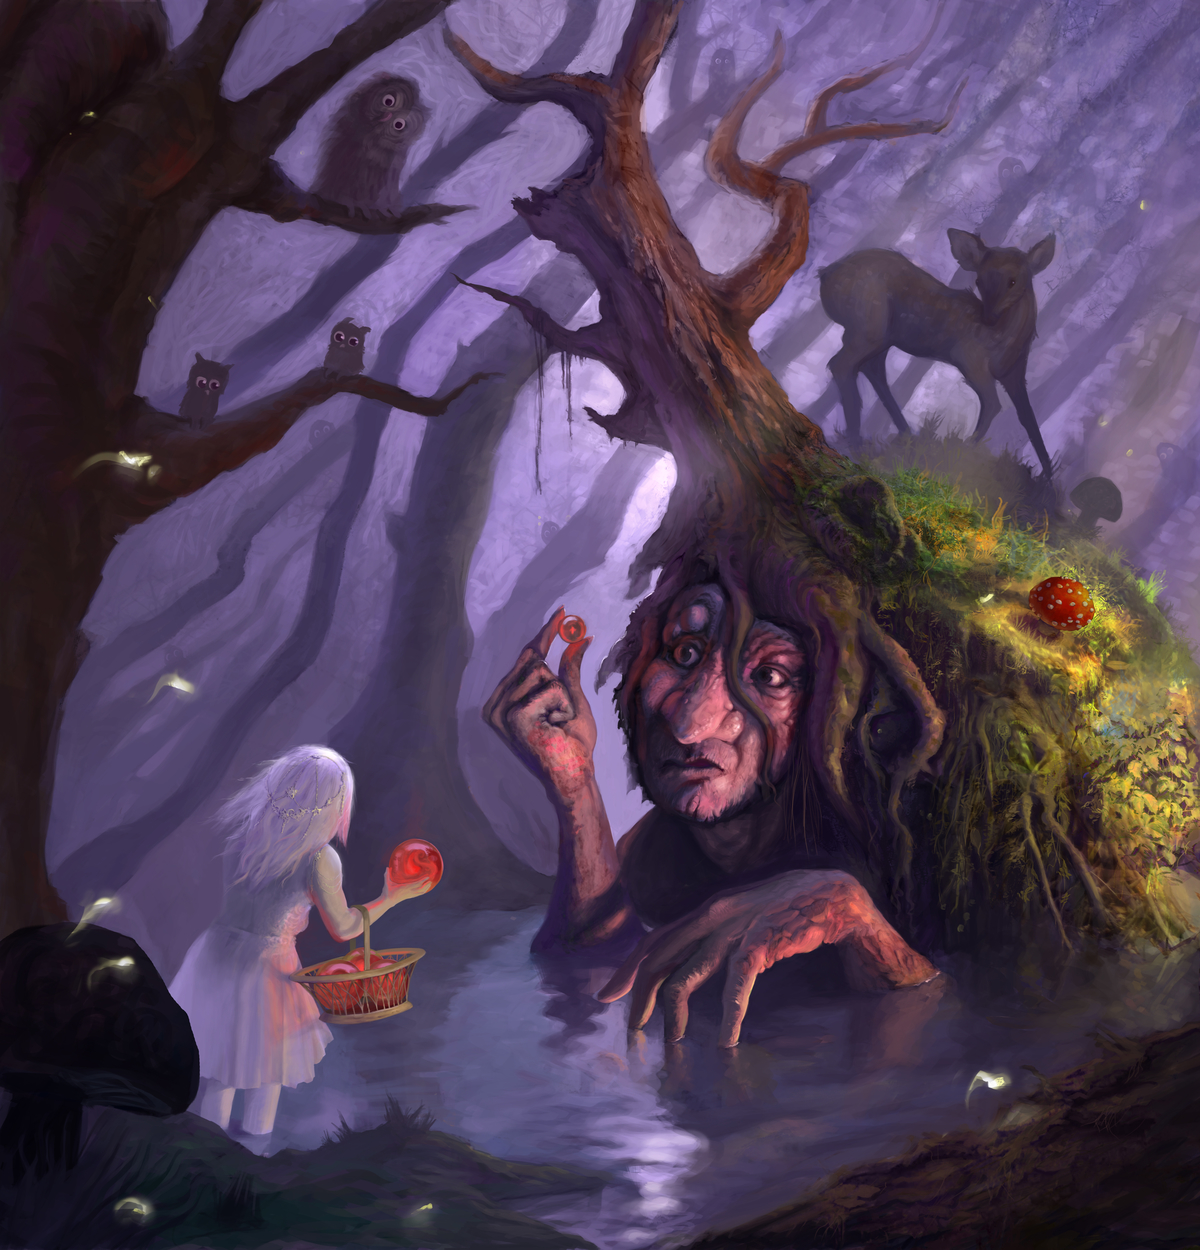 Forest Rendezvouz  Artwork by Khurrum Maqbool